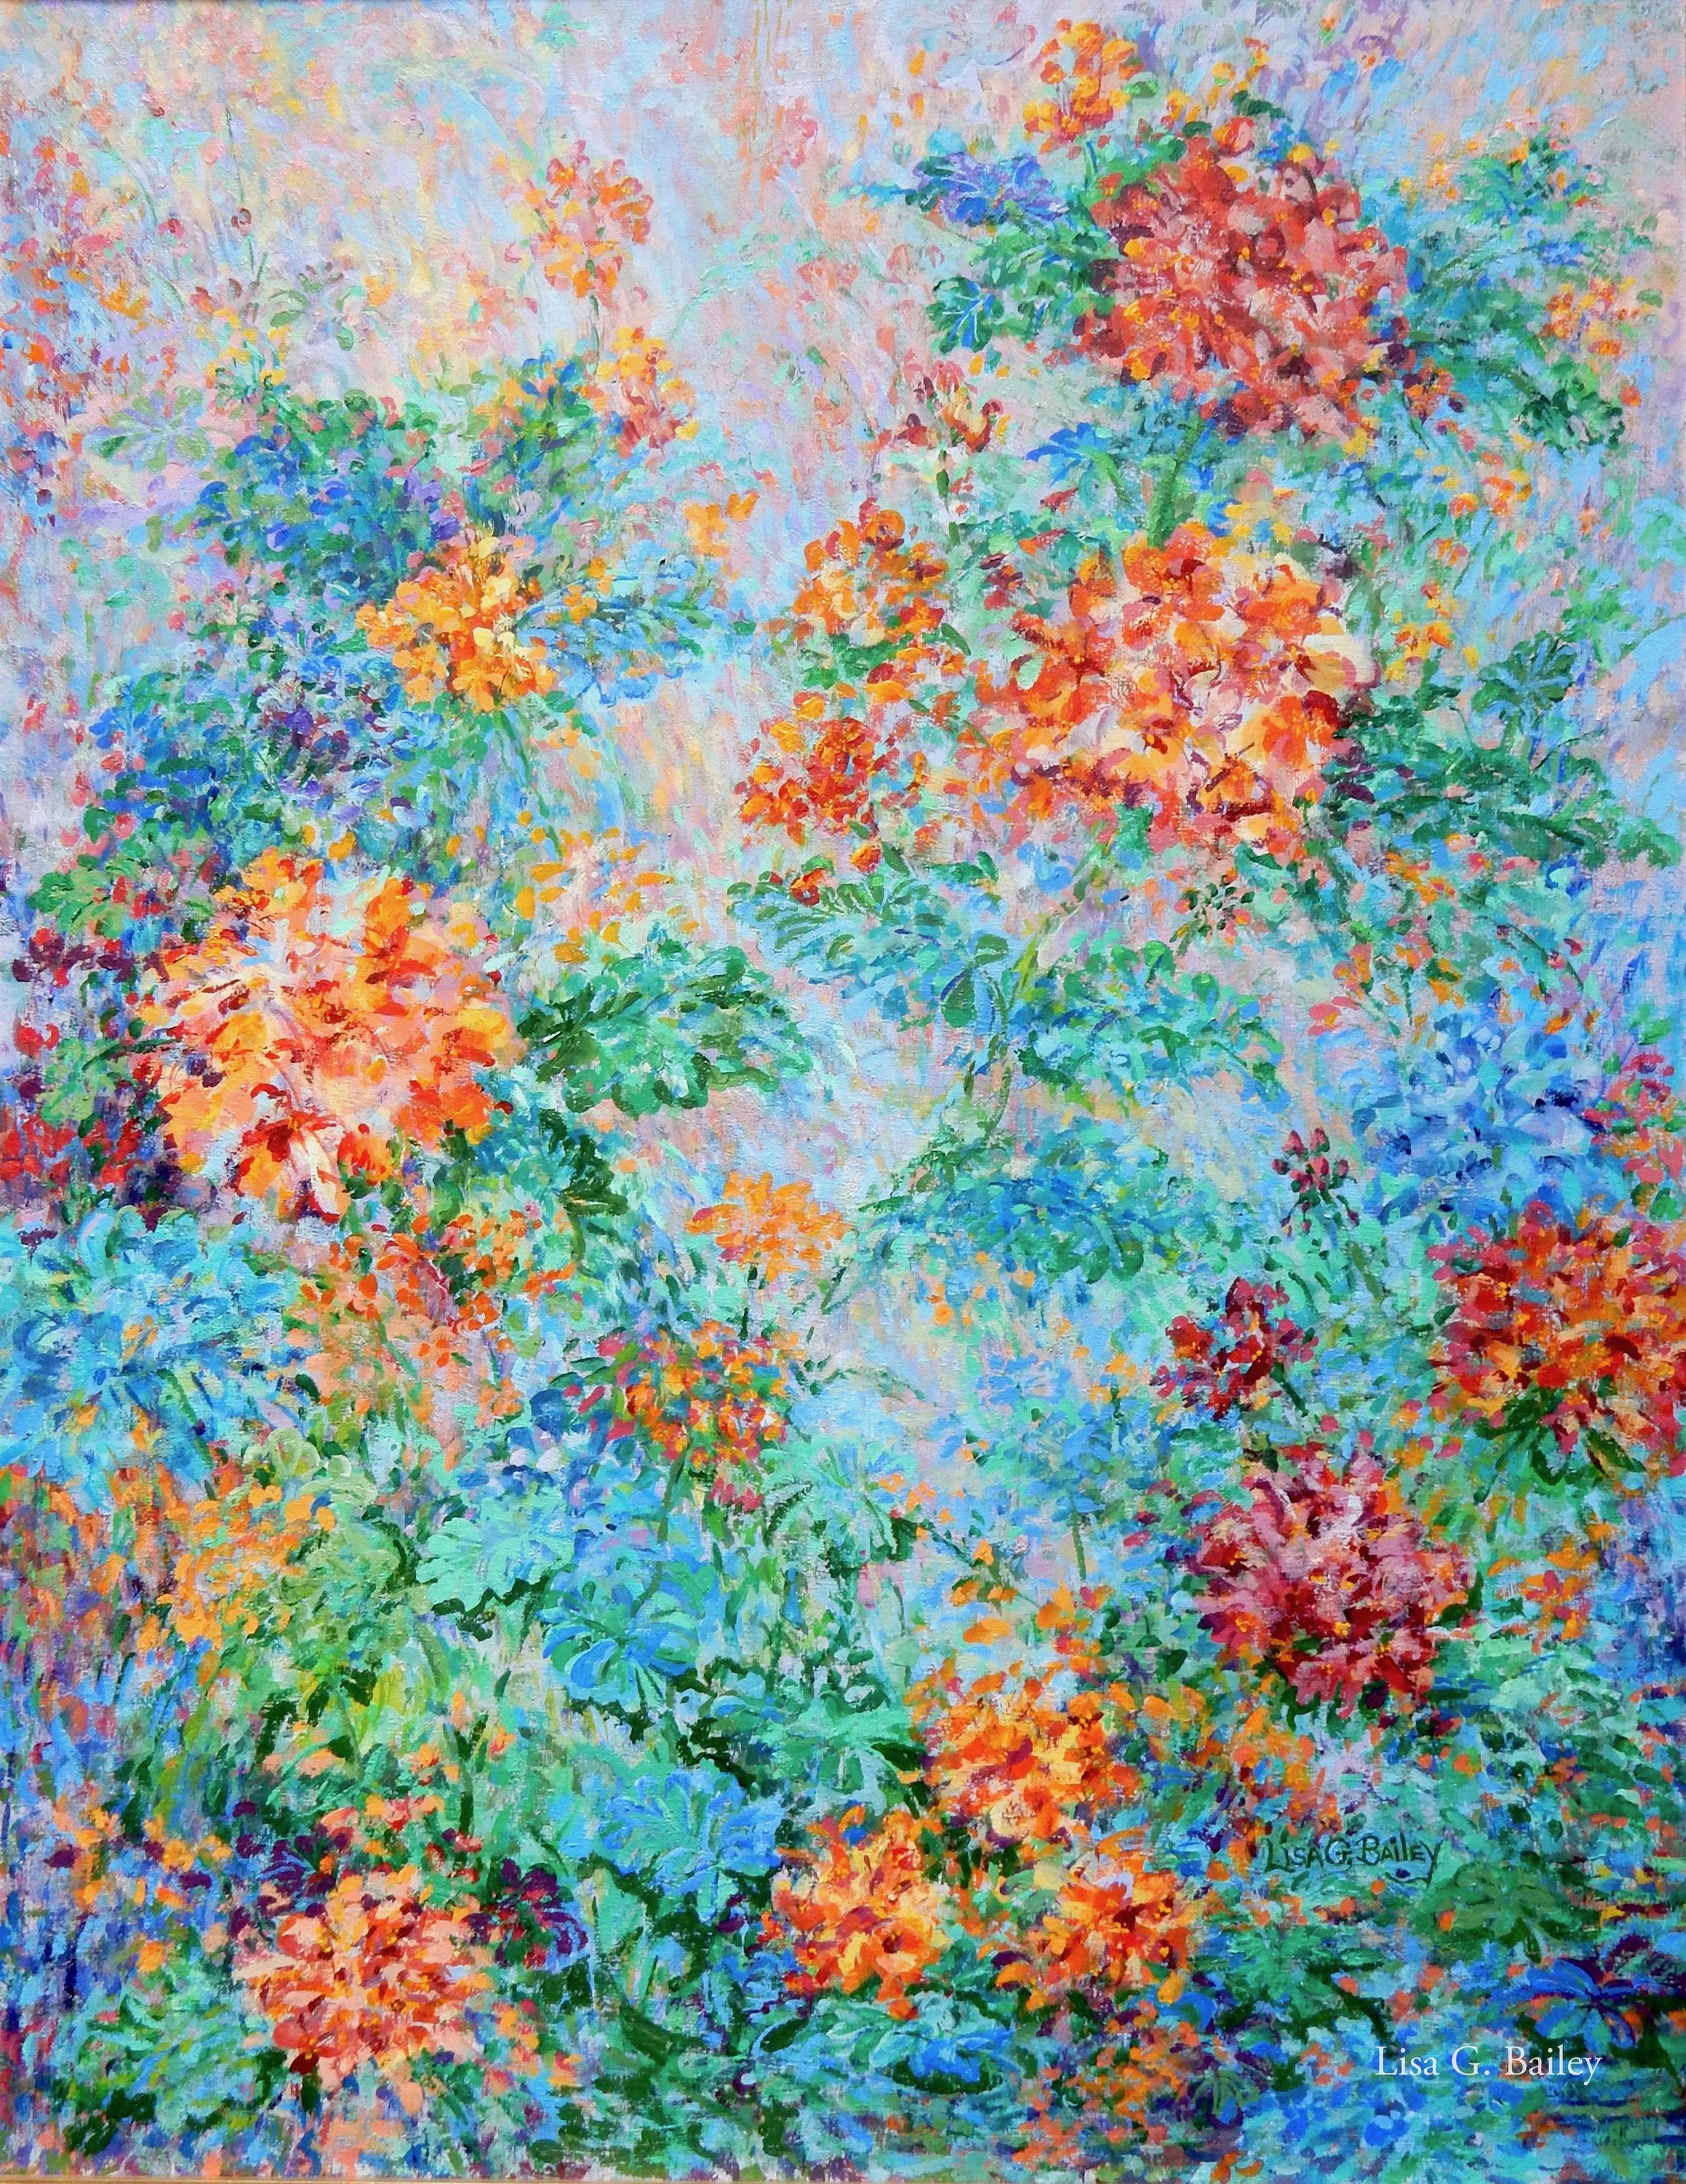 Lisa G Bailey, Efflorescence. acrylic